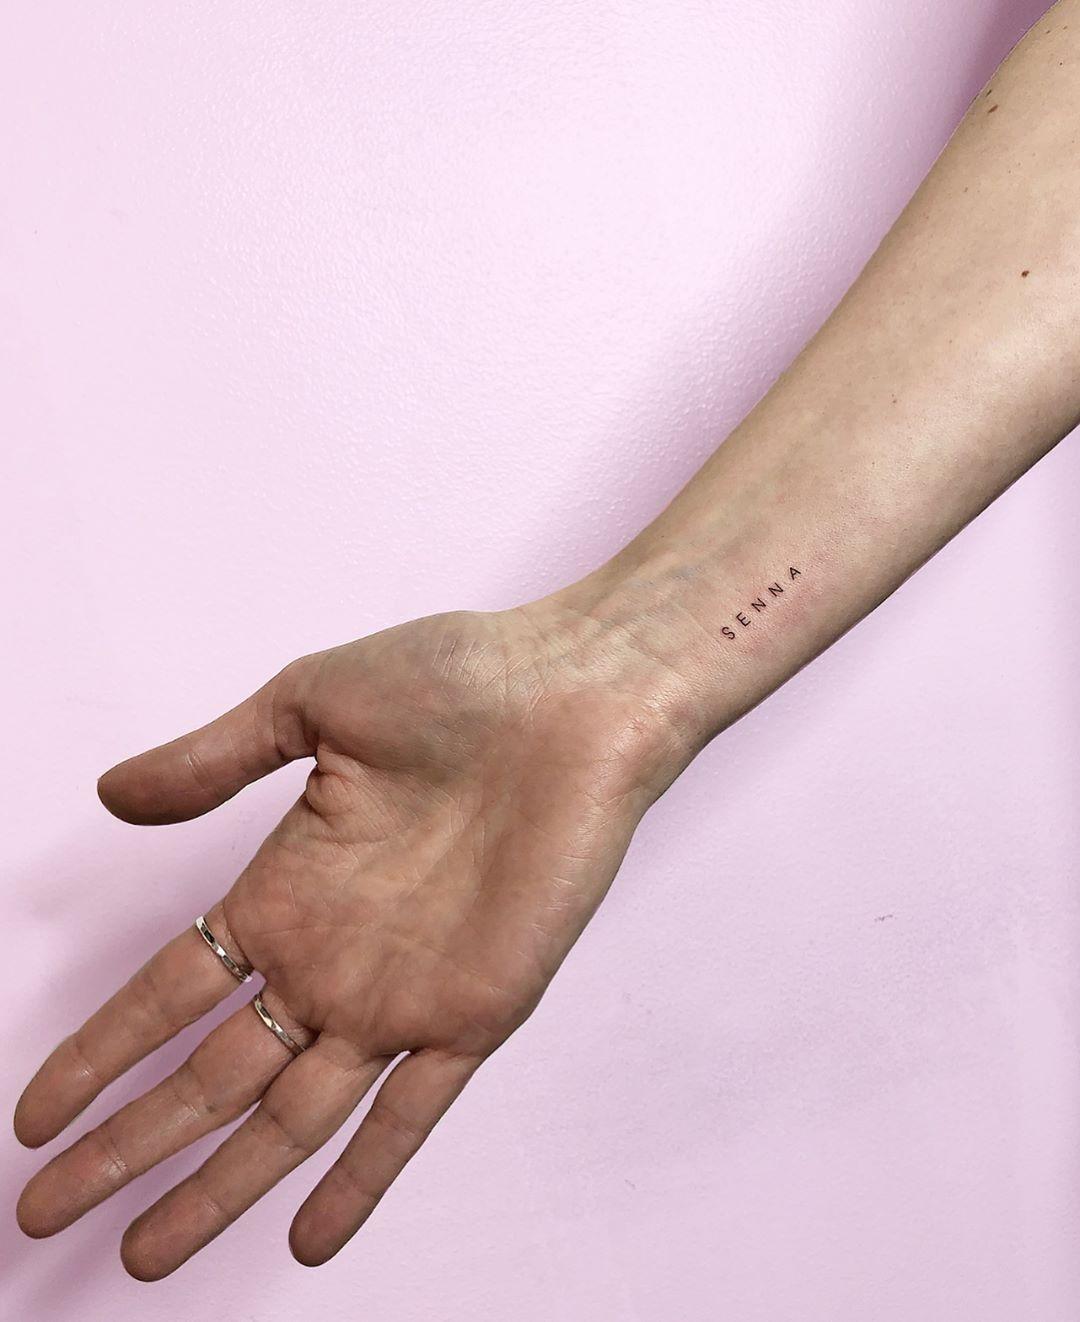 Senna tattoo by @joannamroman